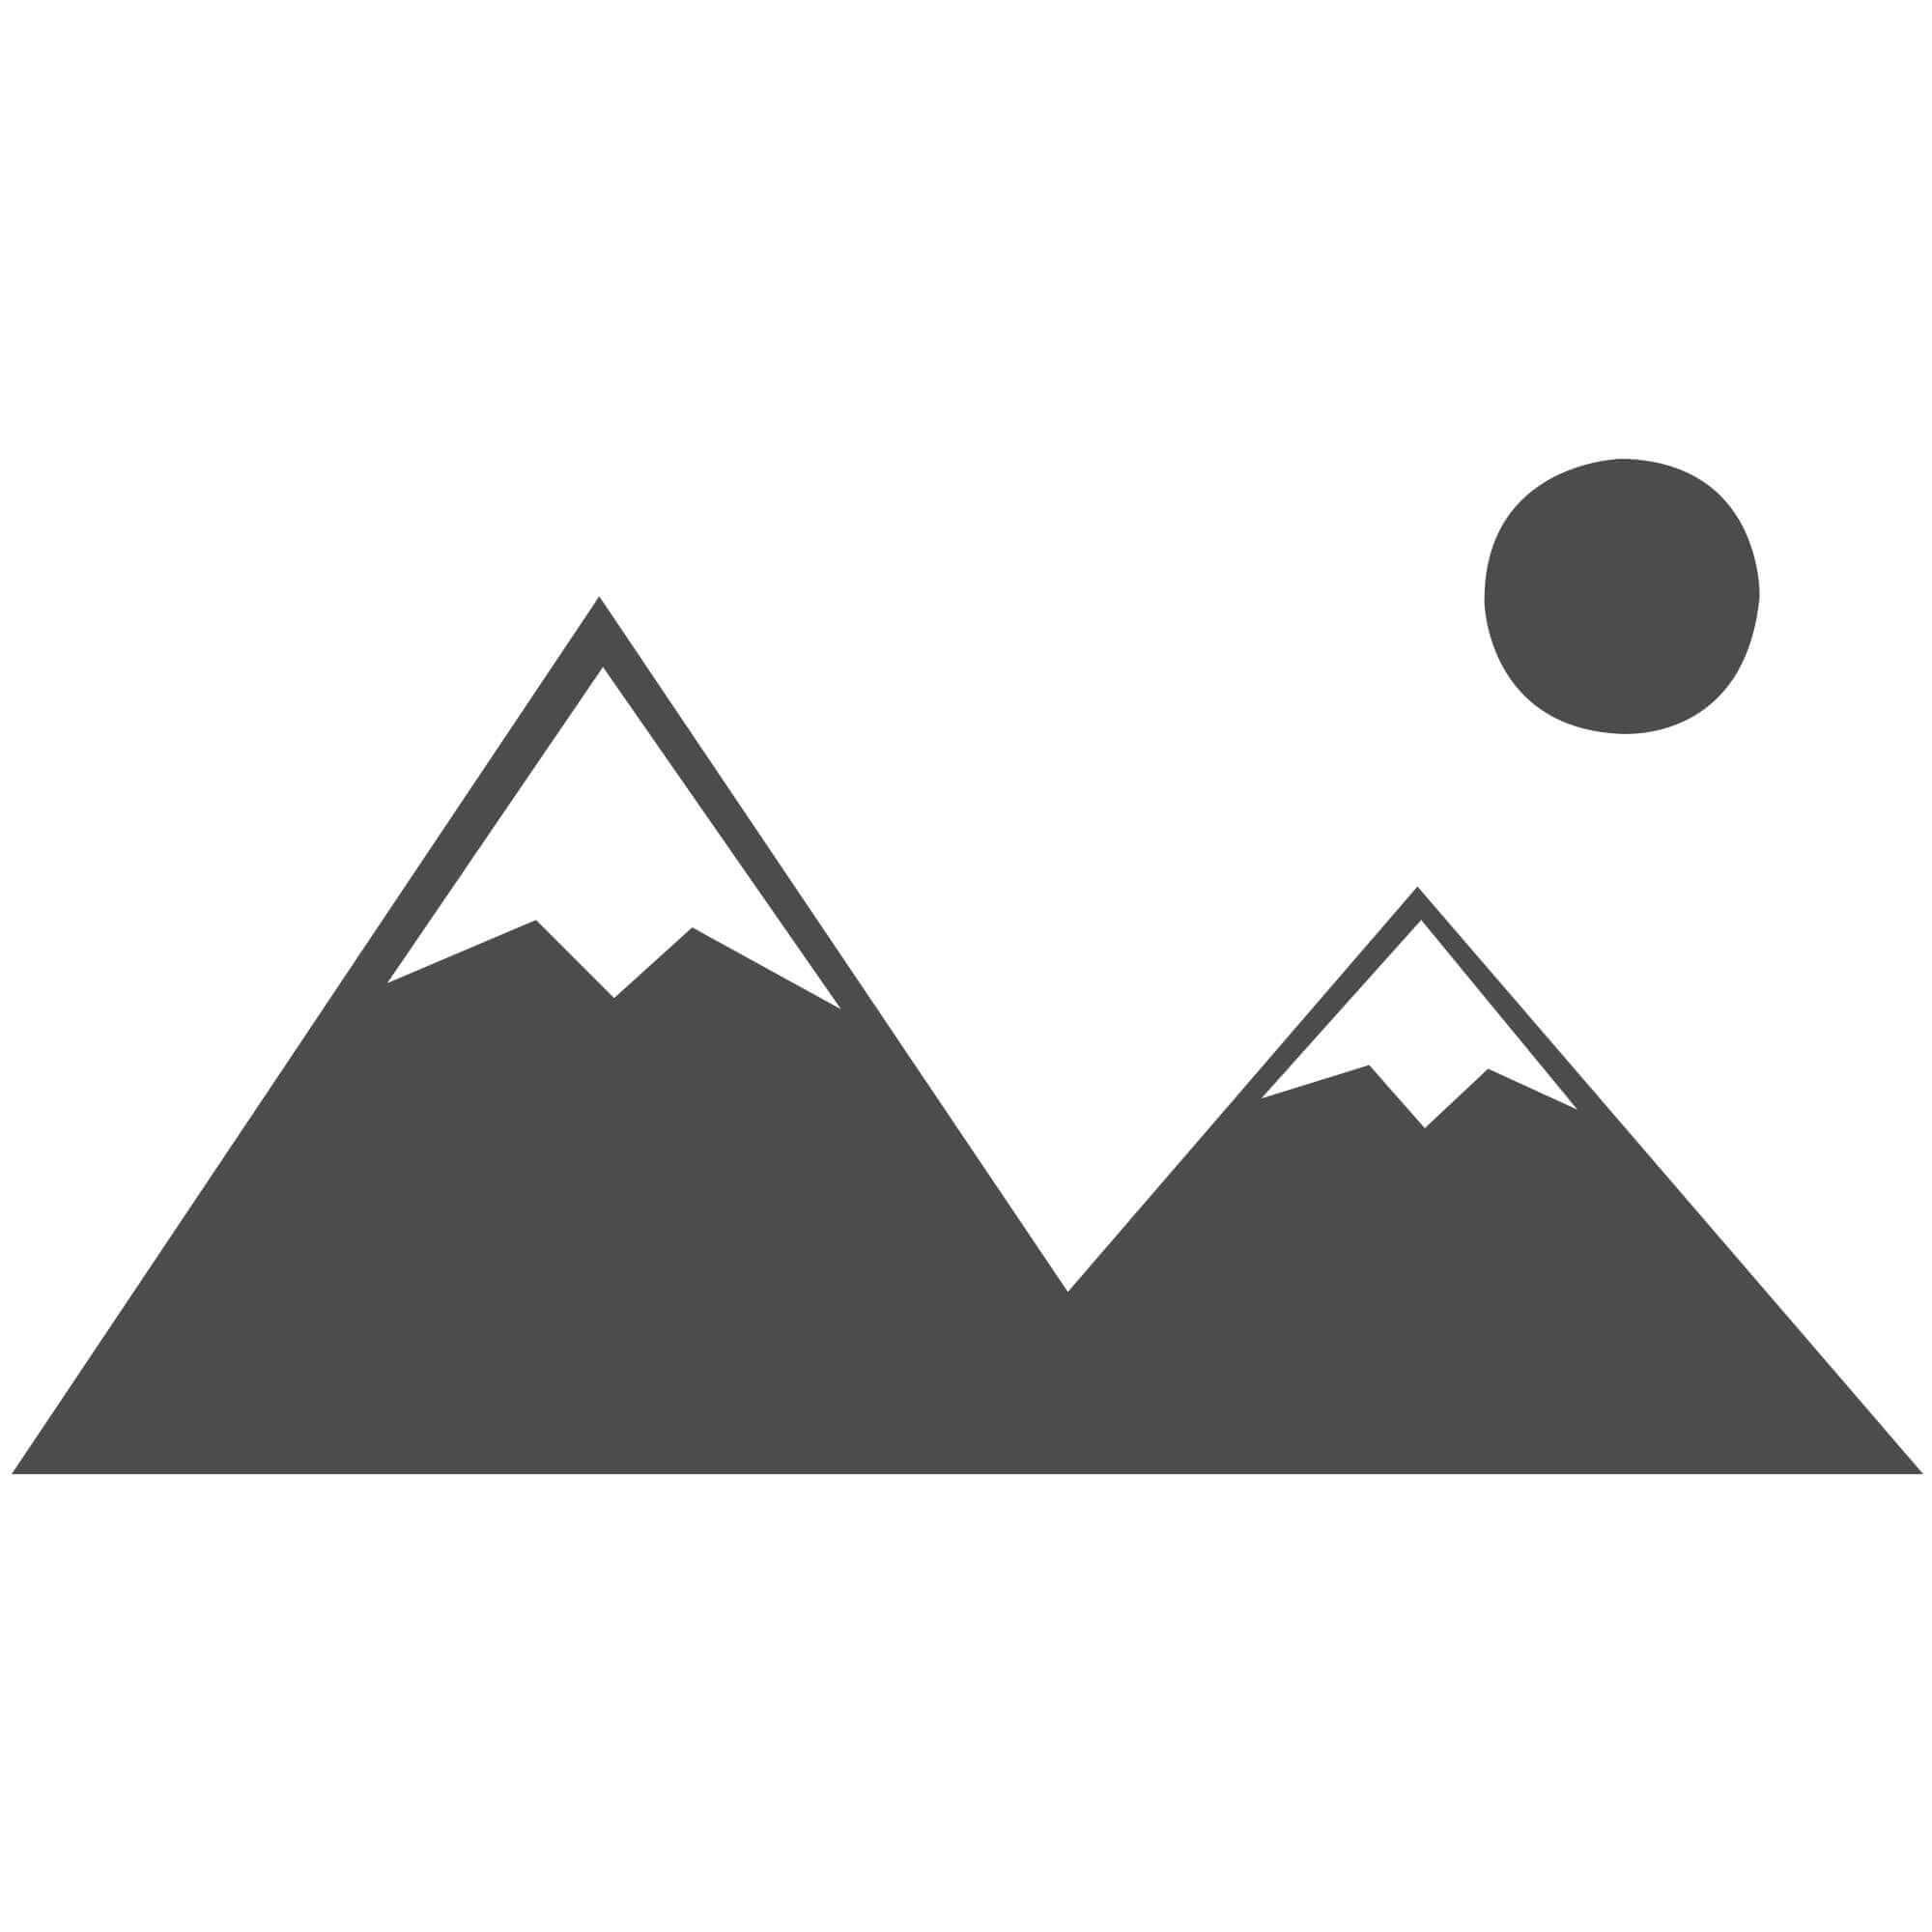 Baileigh Table Saw Manual Tube Bender RDB-050 | Baileigh Bender | Baileigh Industrial